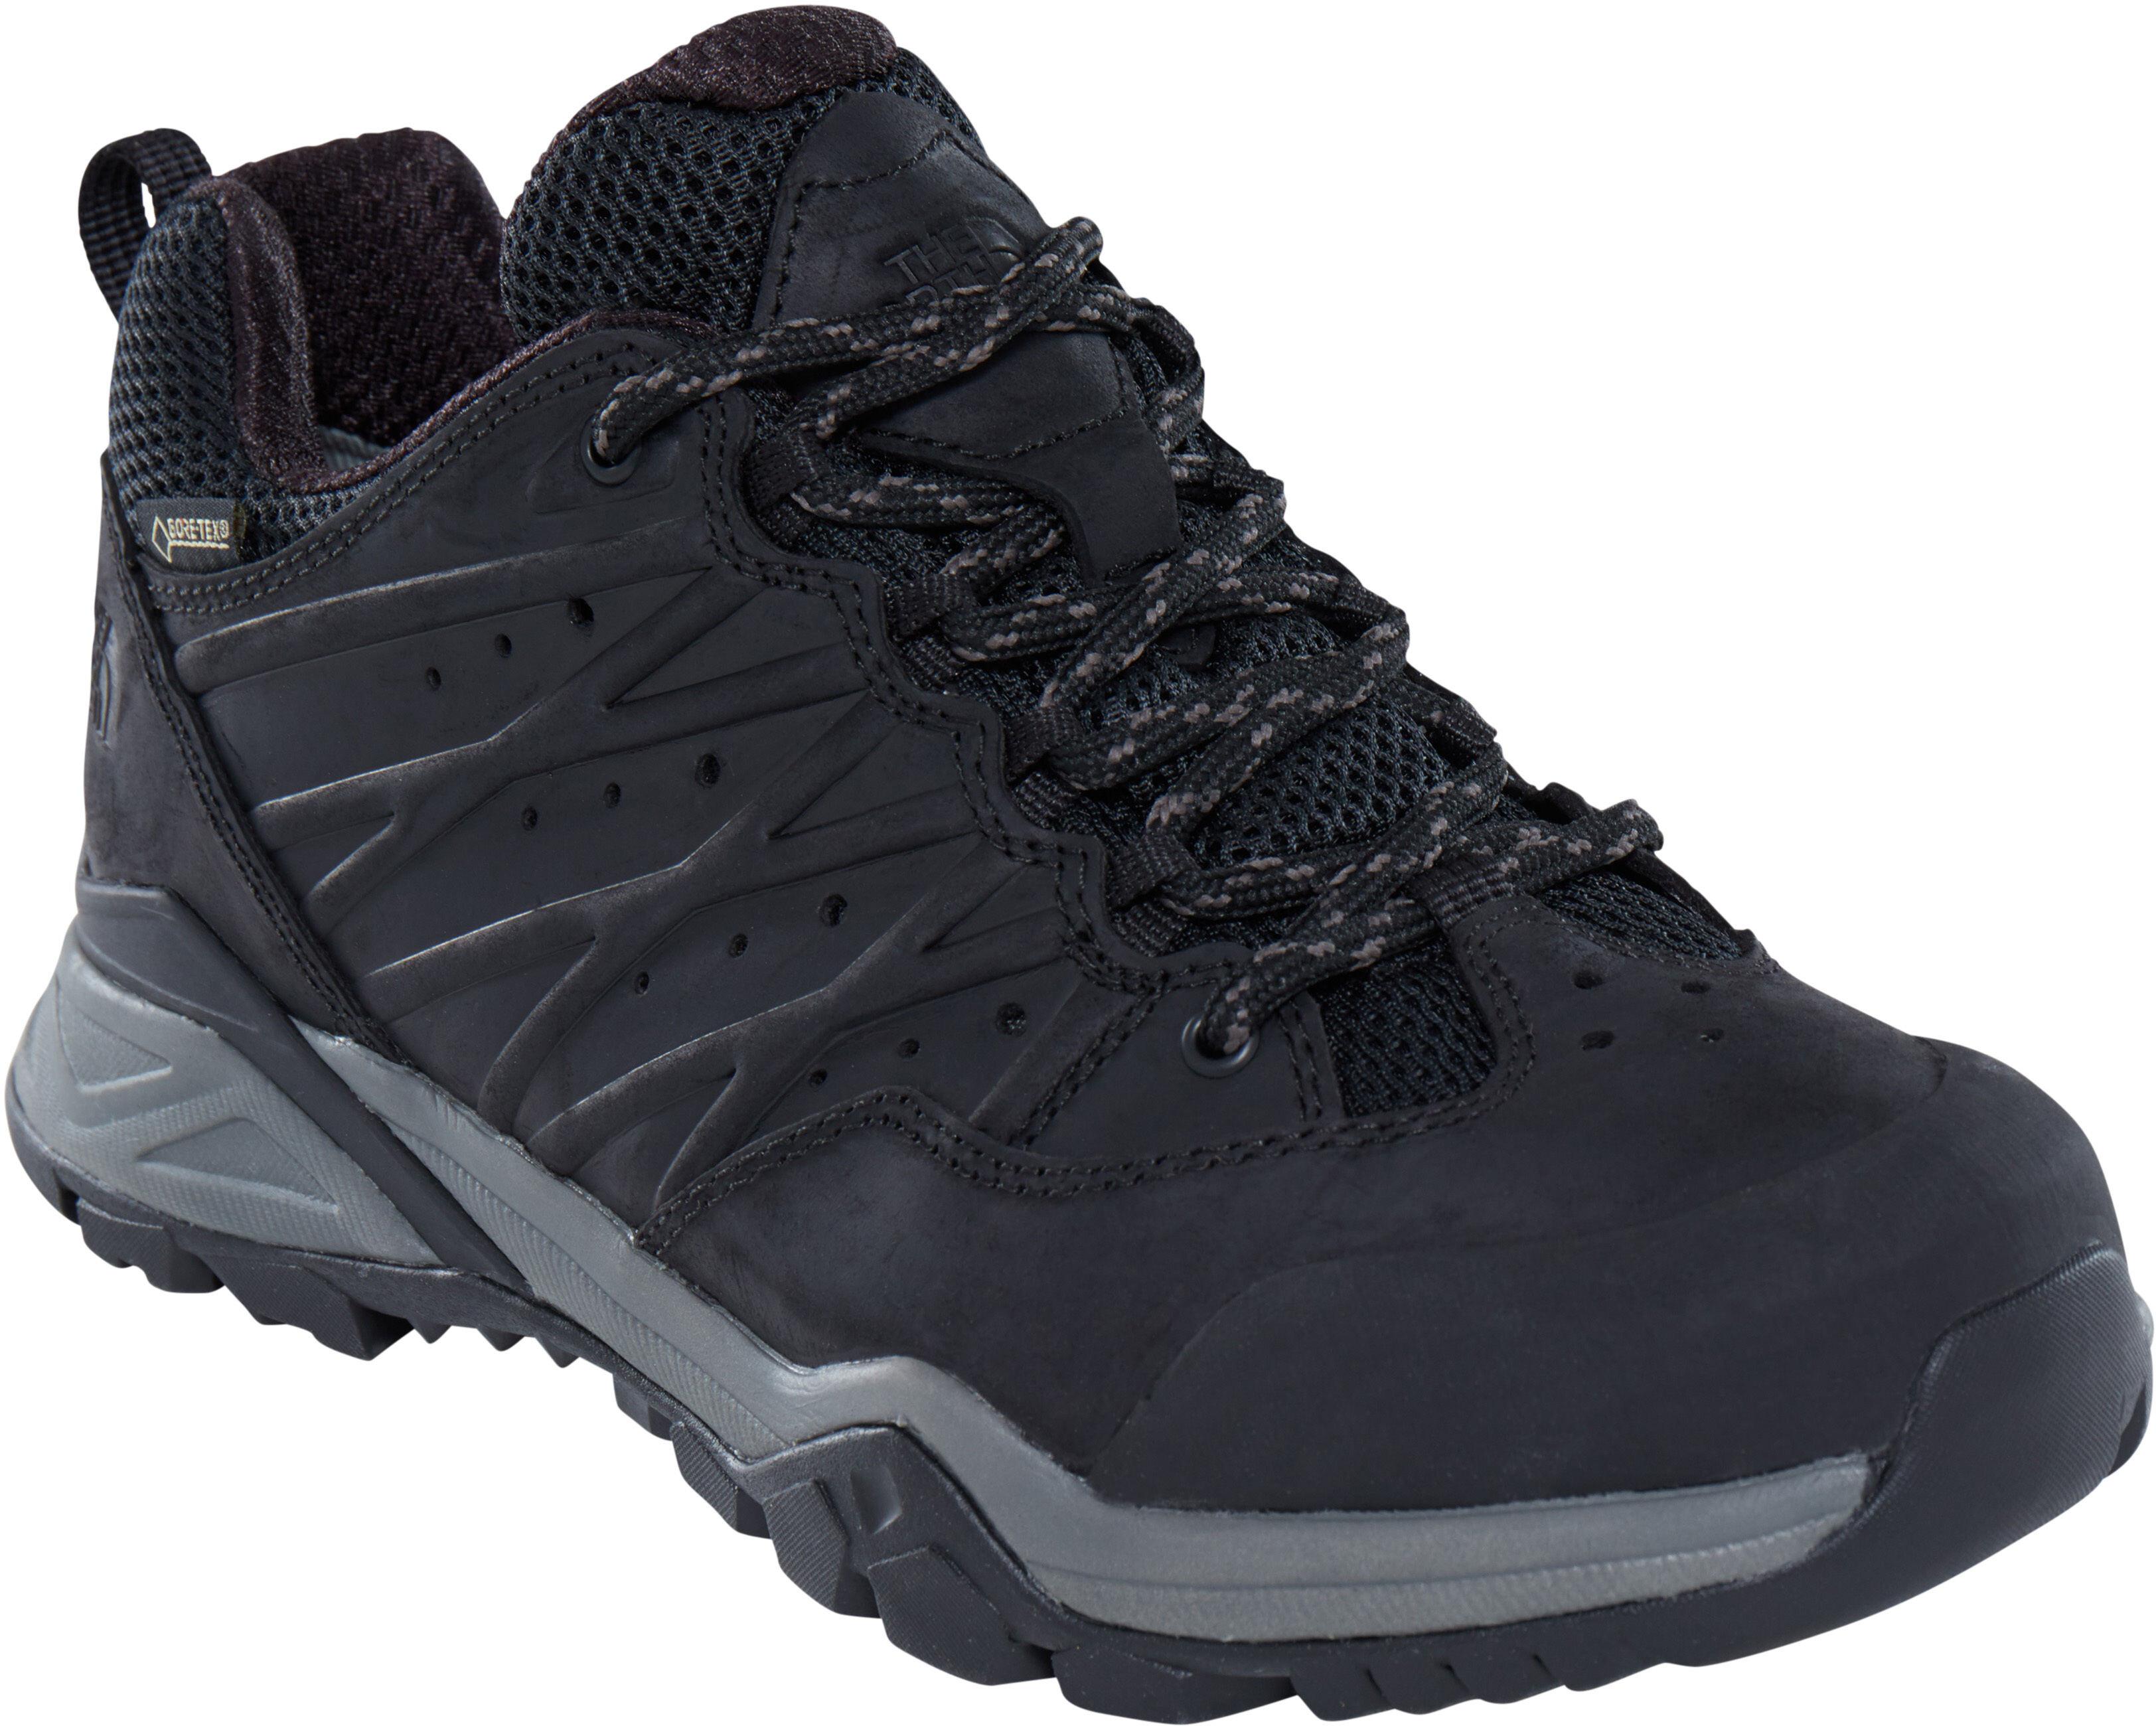 sports shoes add11 e9700 The North Face Hedgehog Hike II GTX Scarpe Donna, tnf black/tnf black